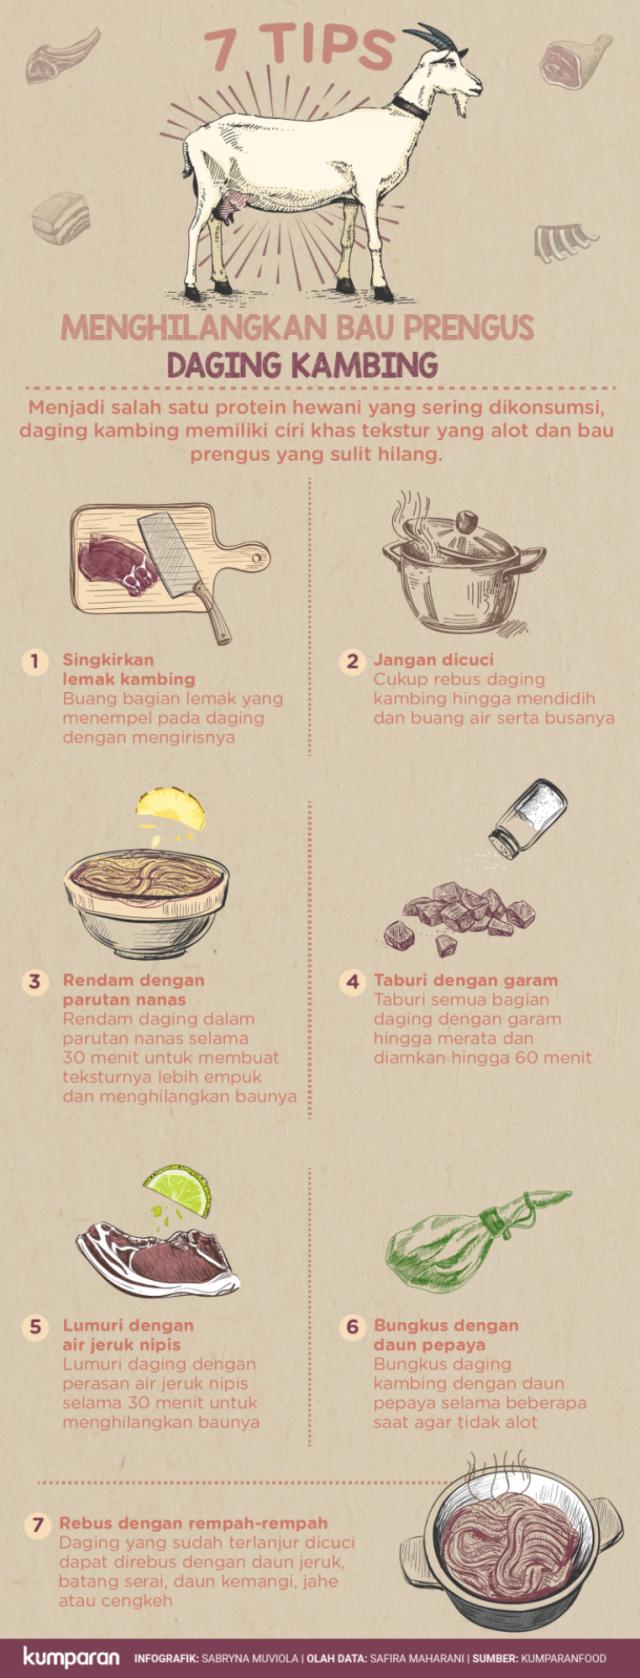 Tips Mengilangkan Bau Menyengat pada Kambing